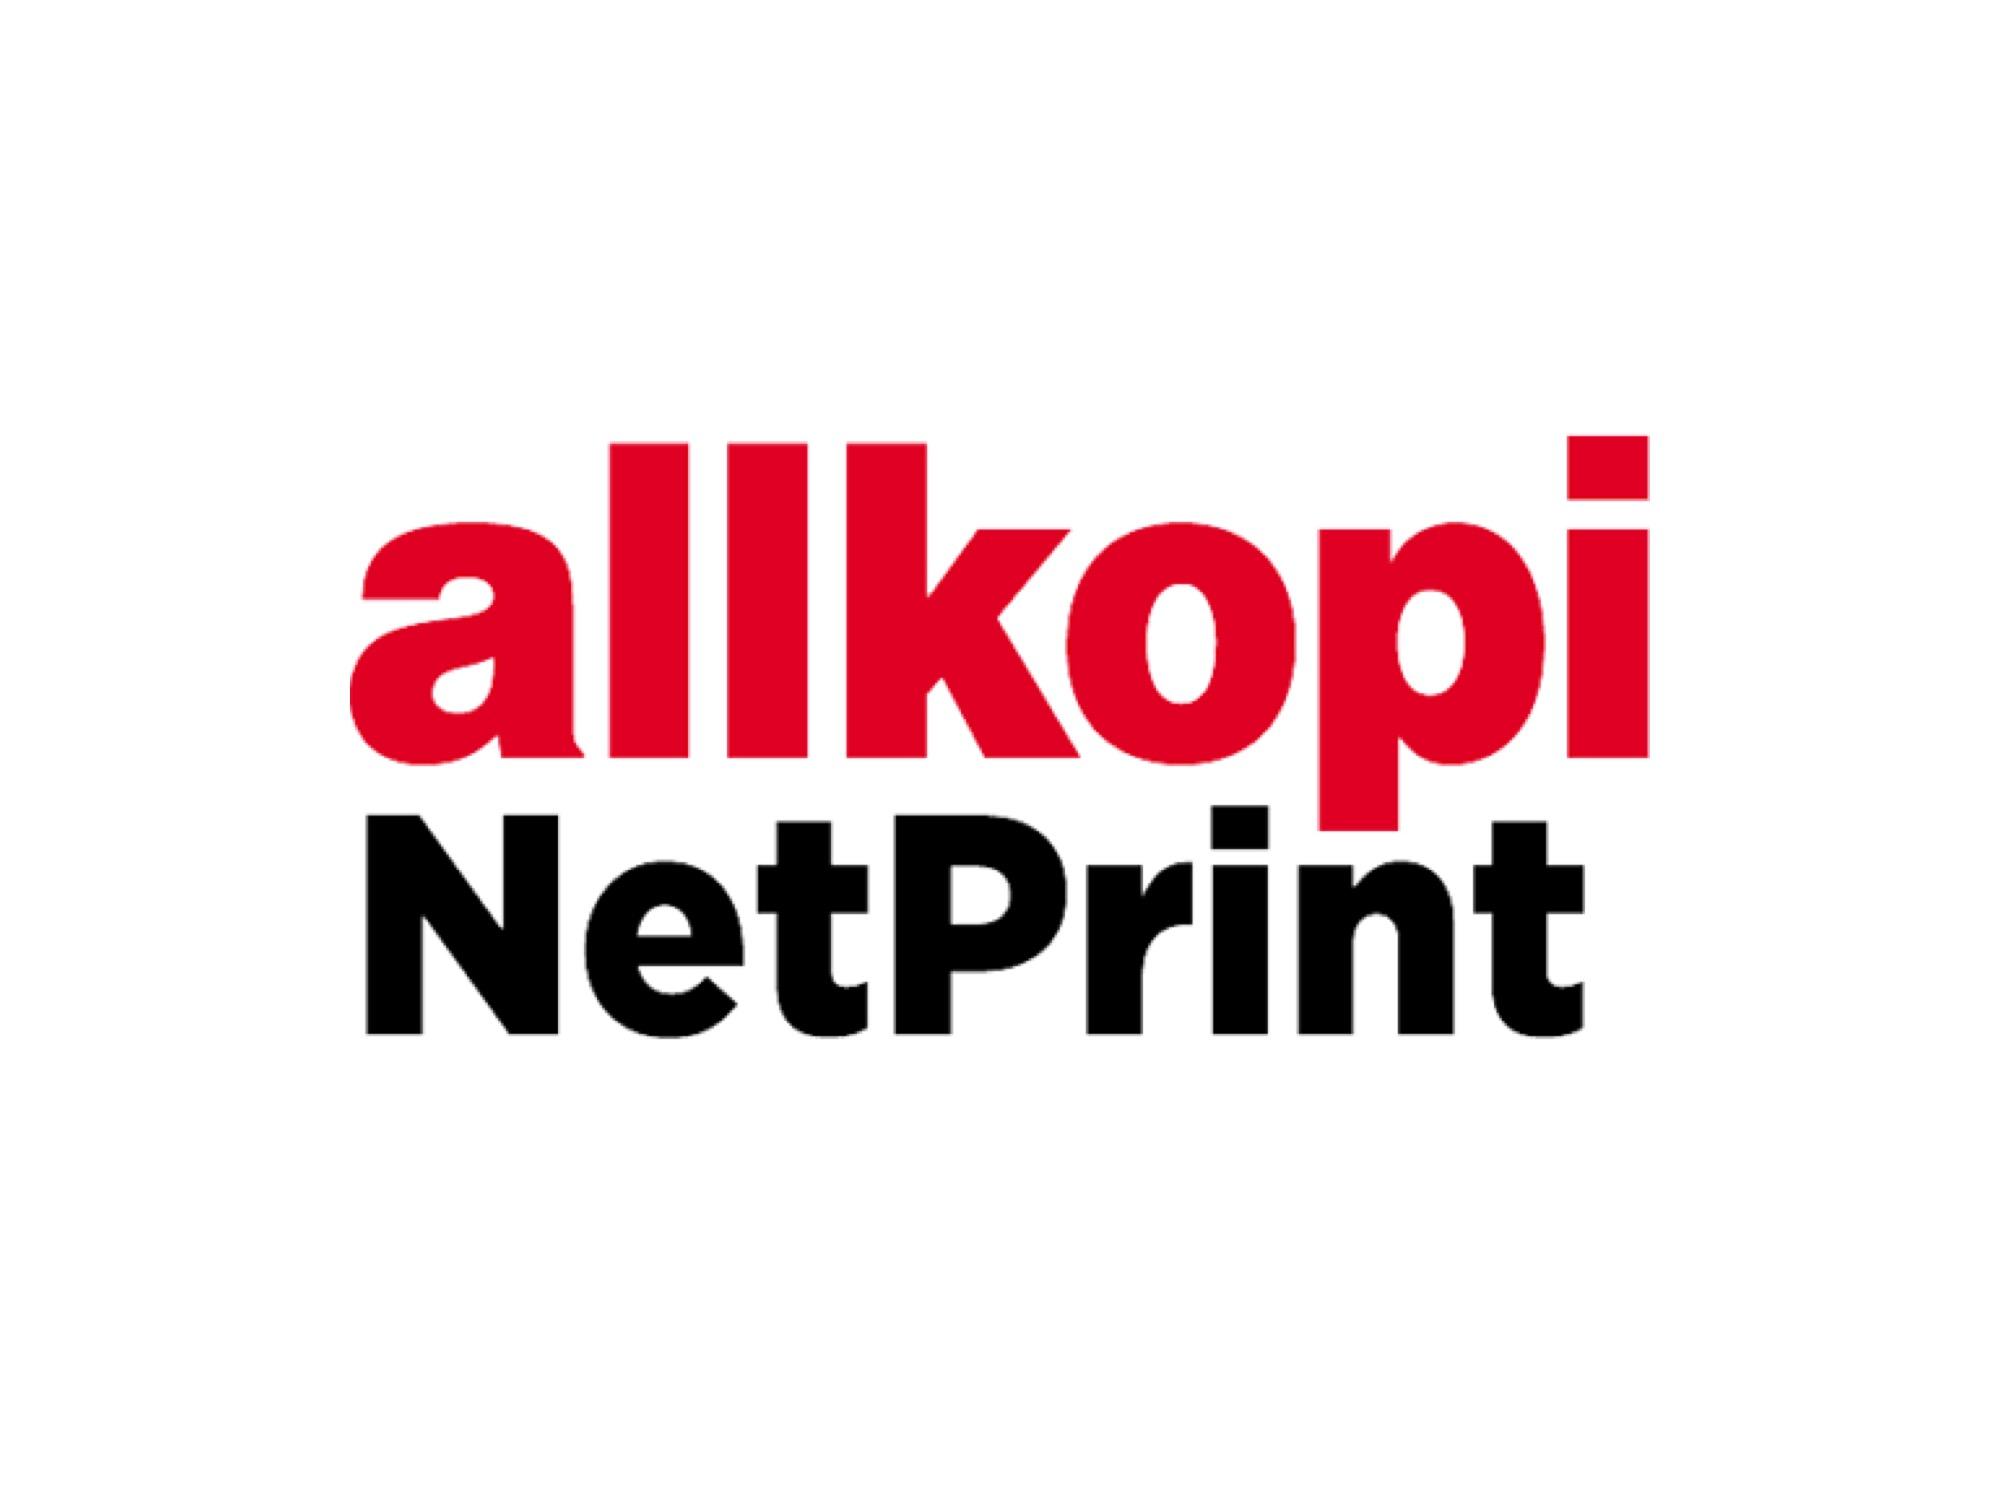 AllkopiNetprint Rød og svart.png